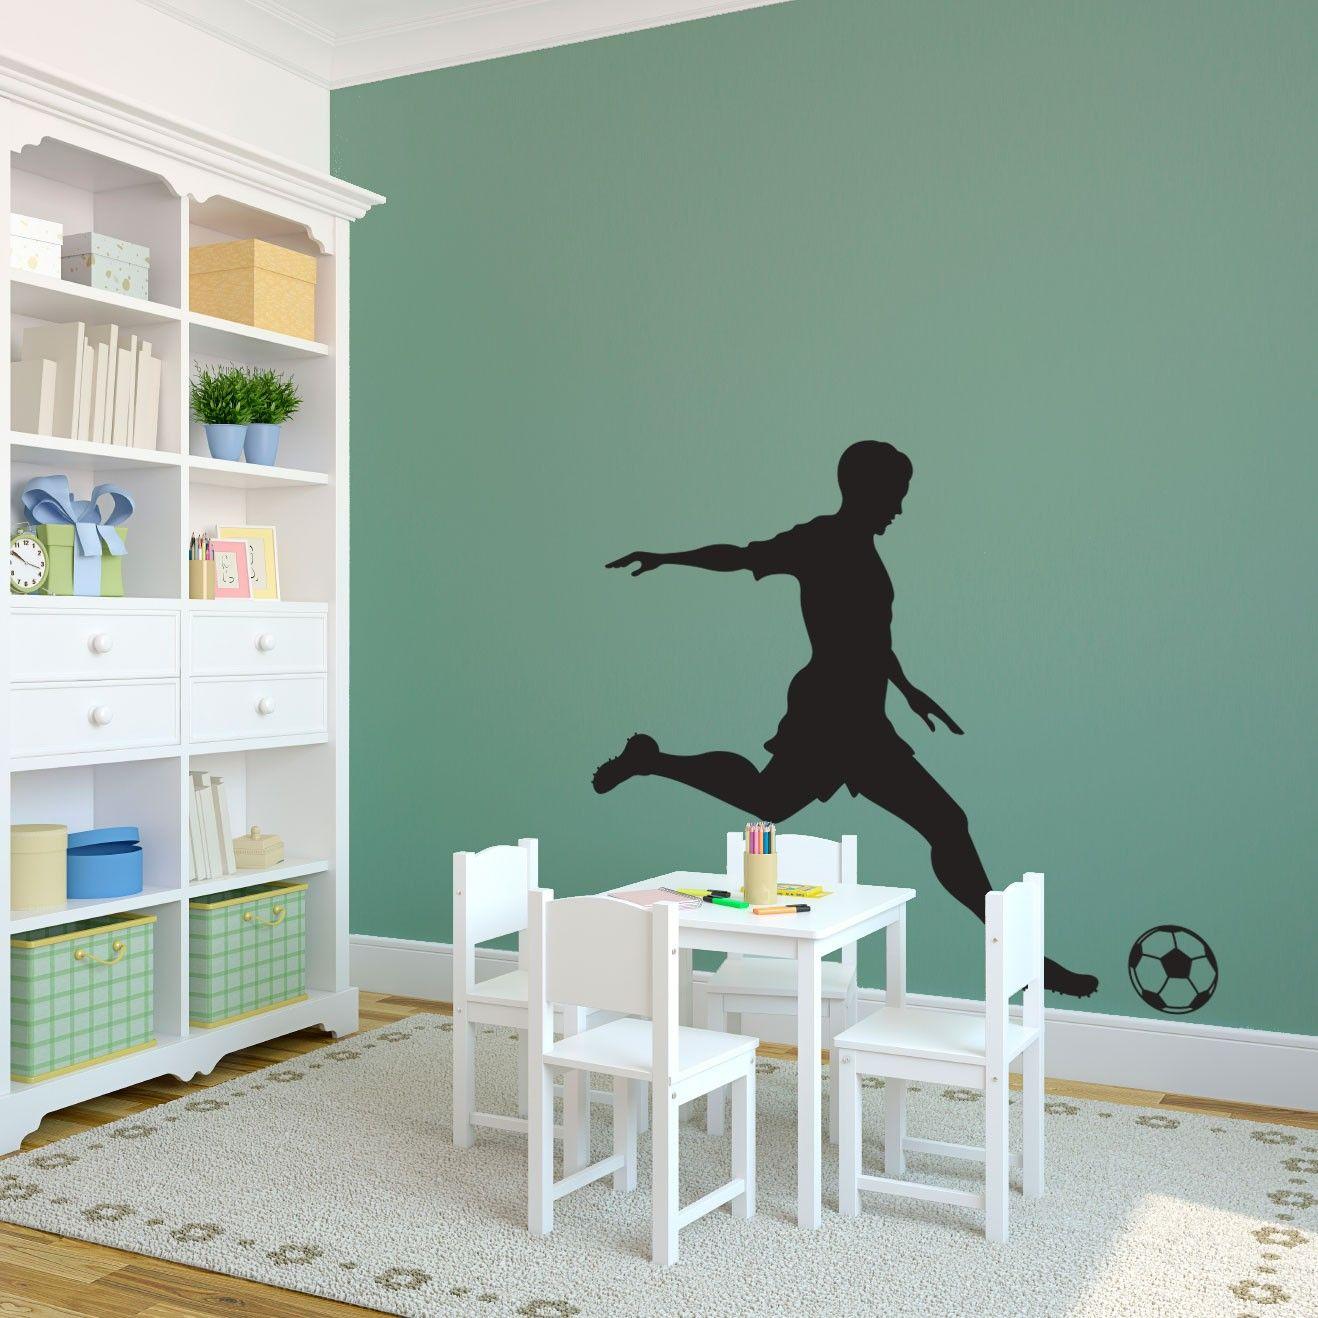 Sports Soccer Player Kicking Ball - Sports - Vinyl Wall Art Decal for Homes, Kids Rooms, Nurseries, Preschools, Kindergartens, Elementary Schools, Middle Schools, High Schools, Universities, Colleges